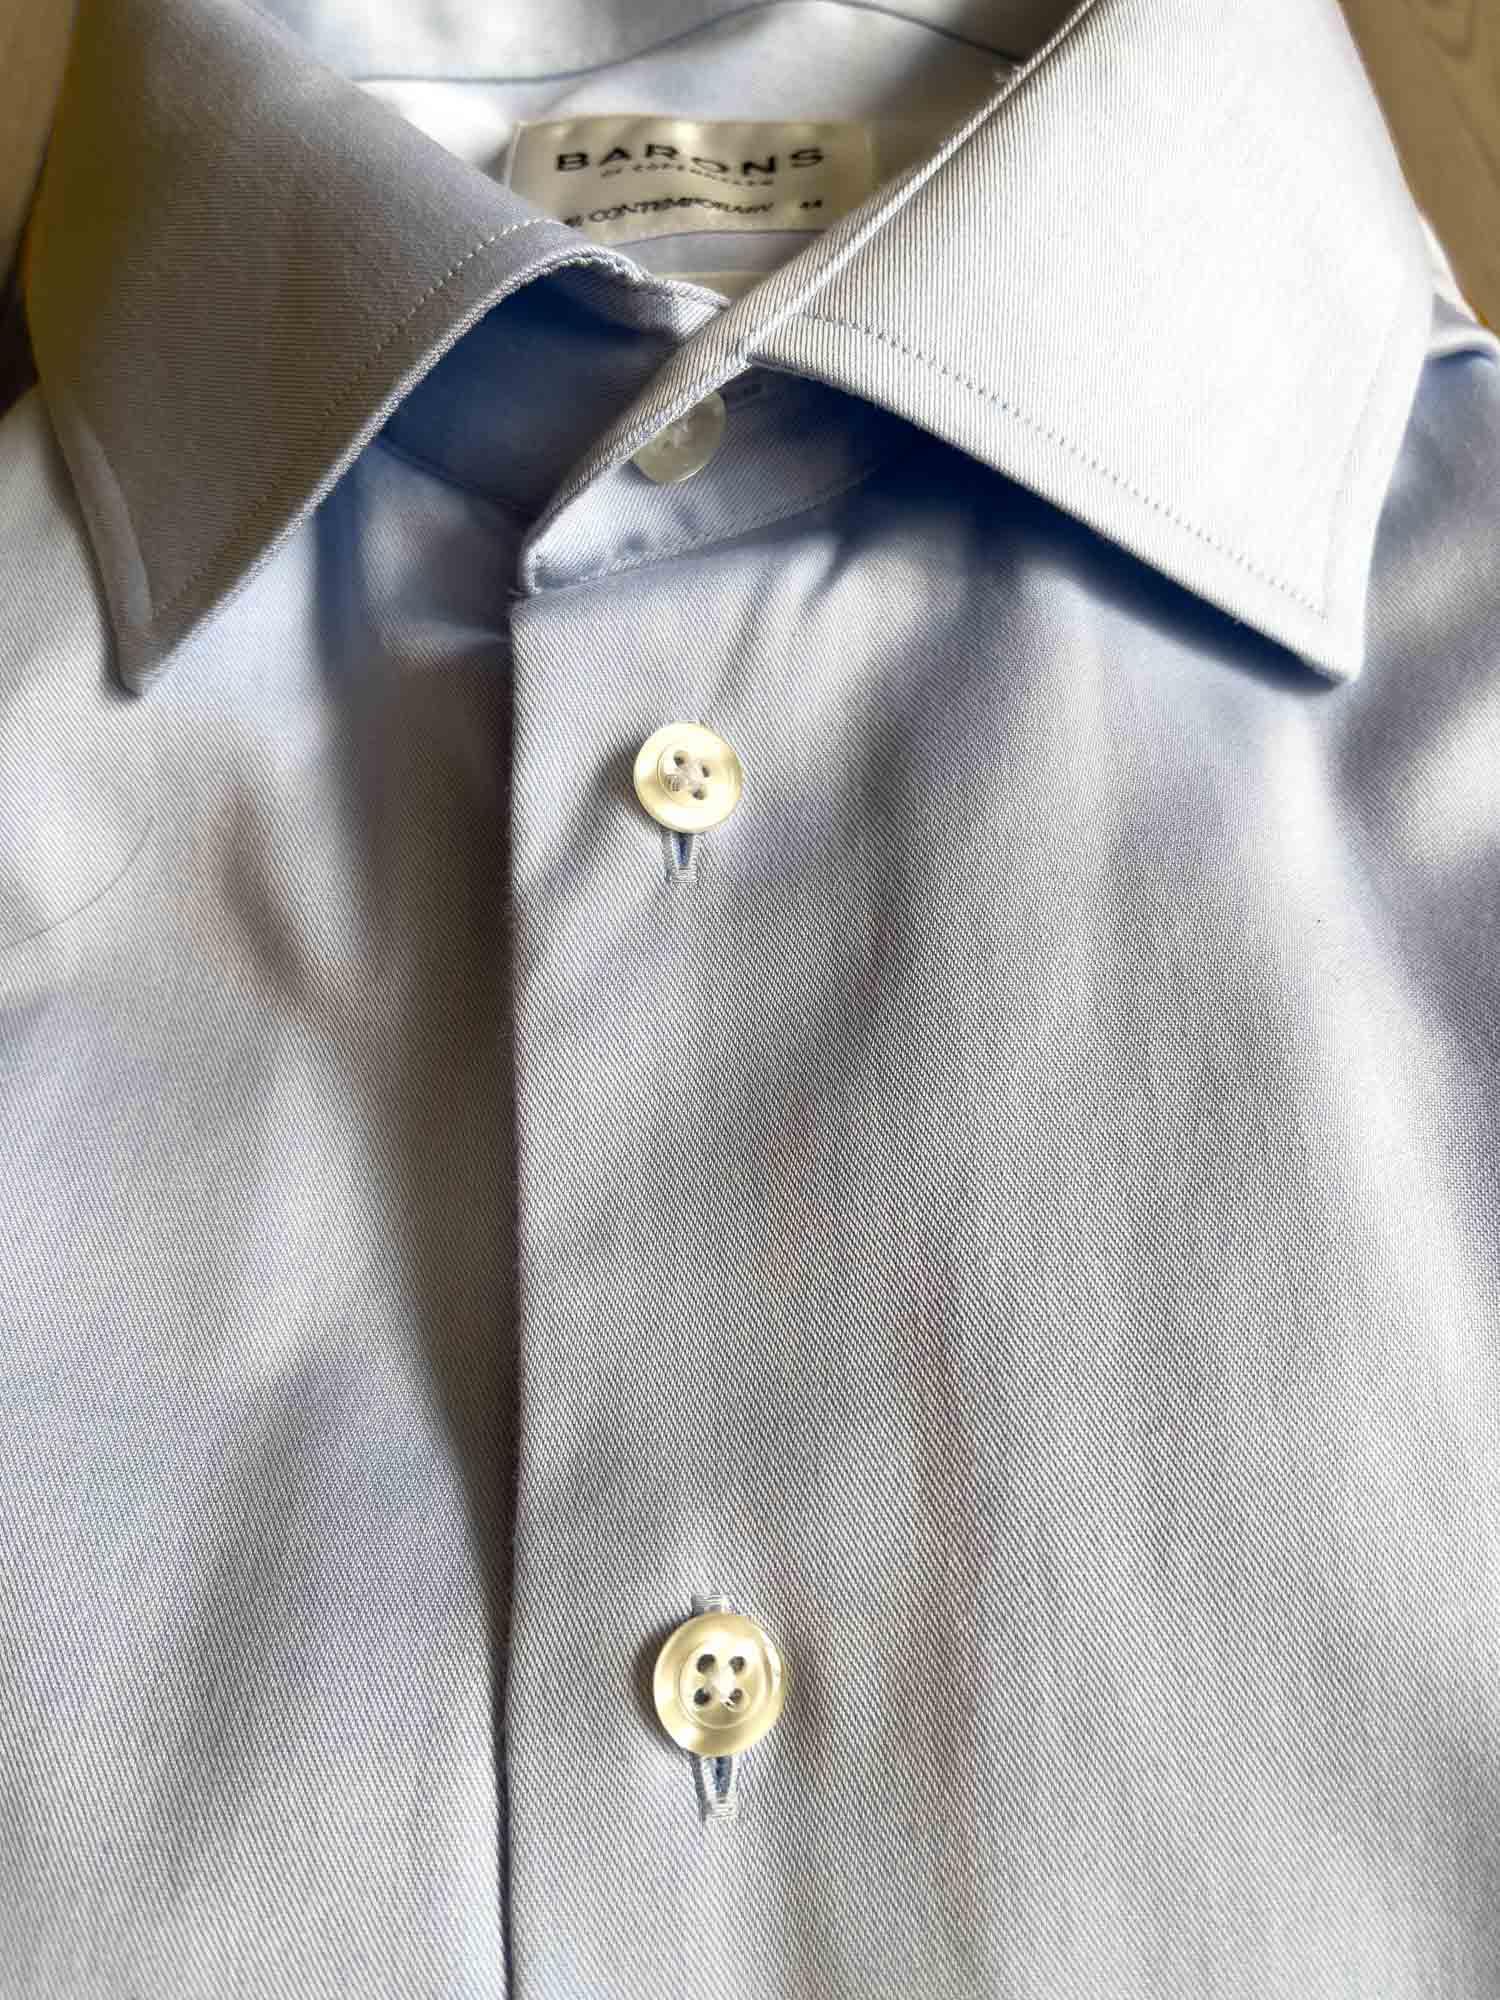 barons skjorter review